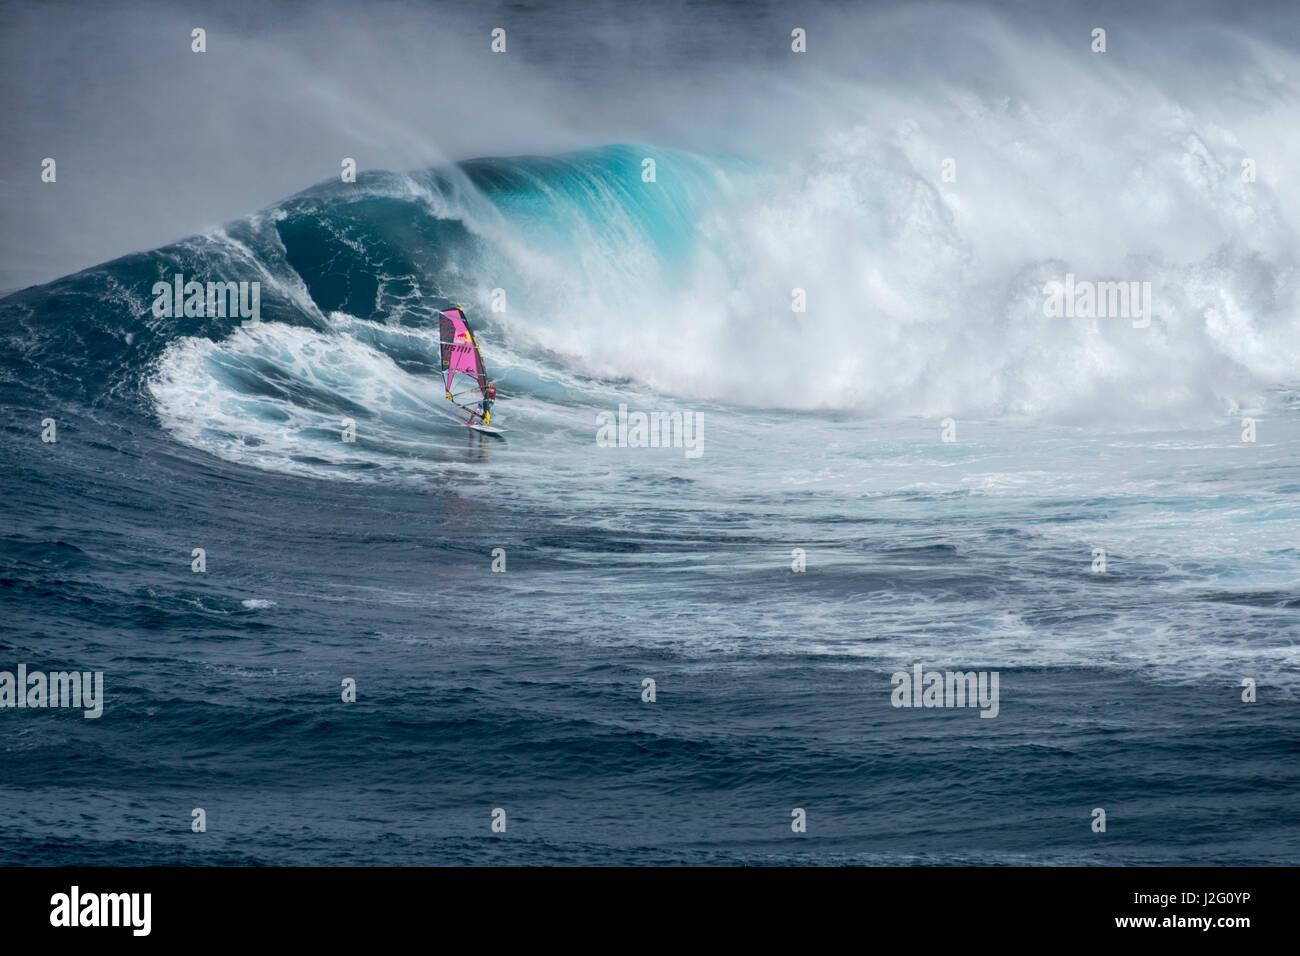 33c6edea0 World champion Robby Naish windsurfing monster waves at Pe ahi Jaws